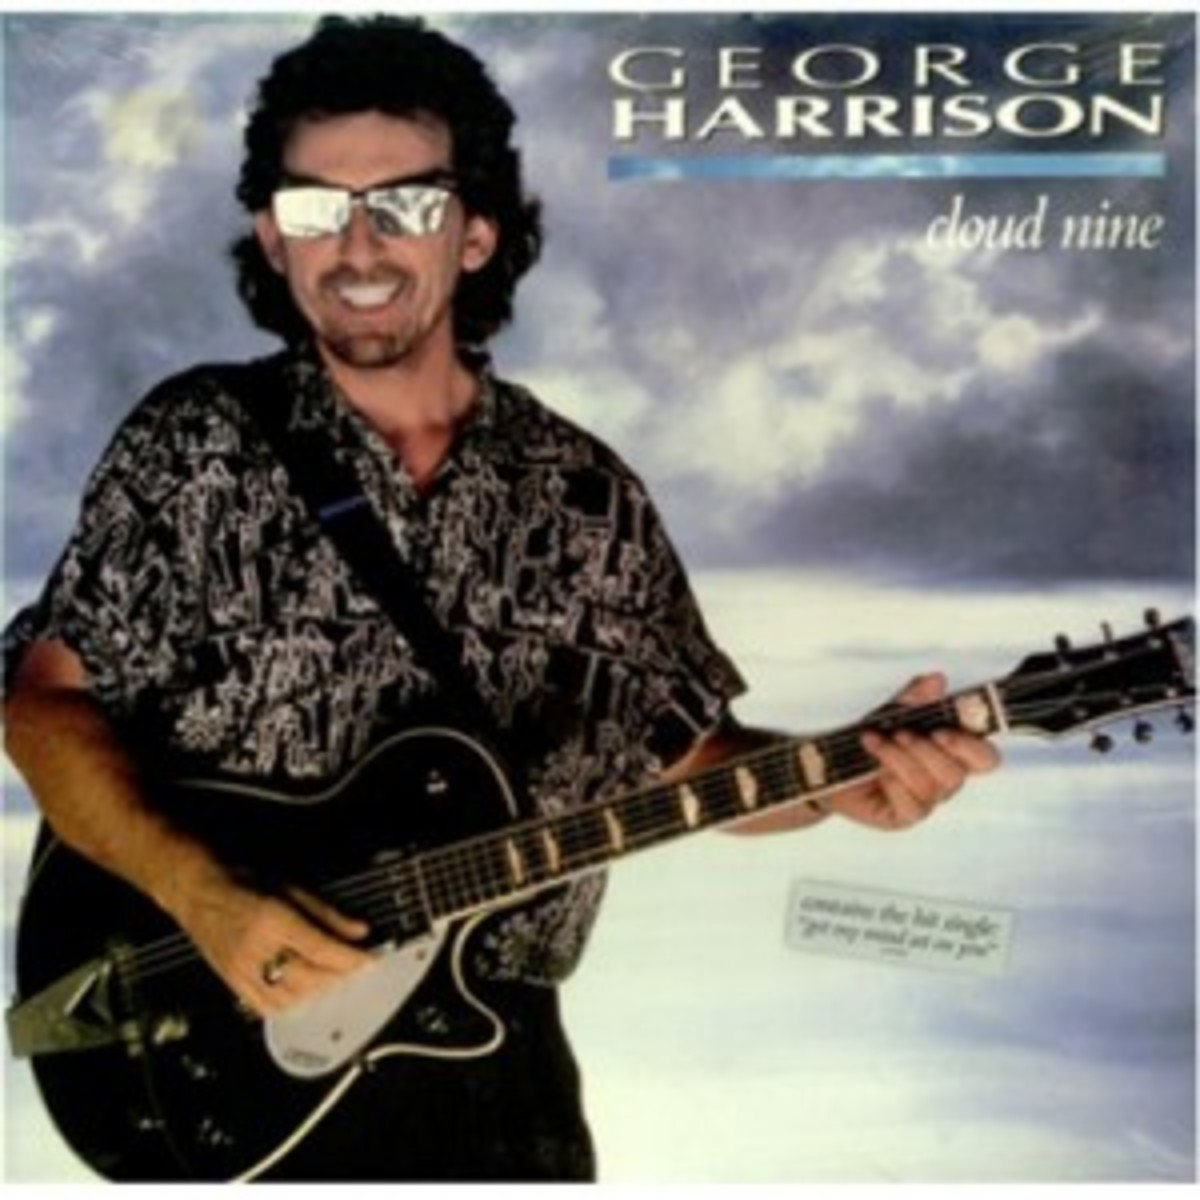 george-harrison-cloud-nine-seal-422480